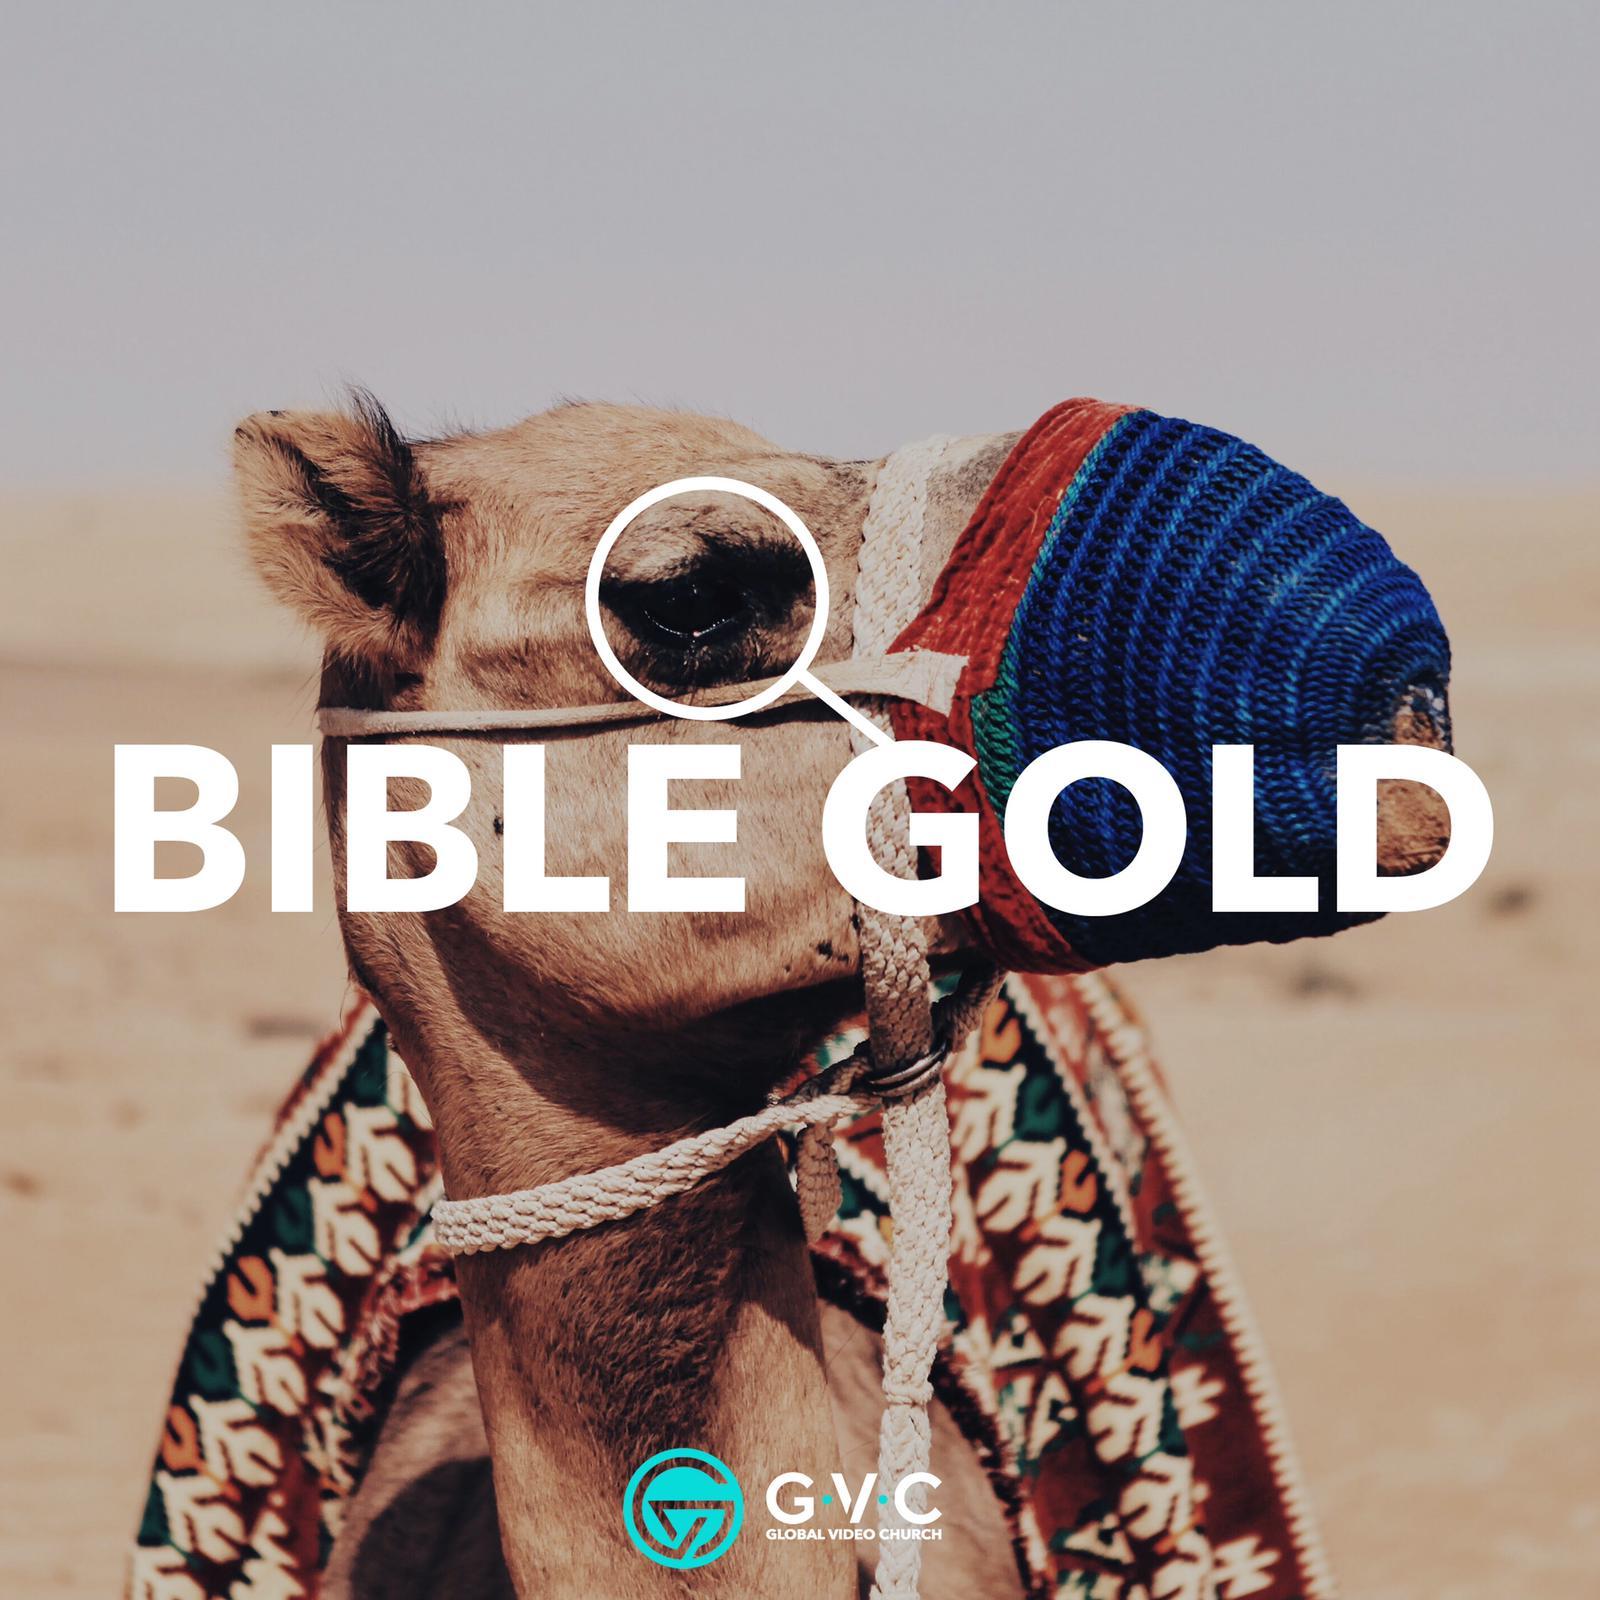 BIBLE GOLD